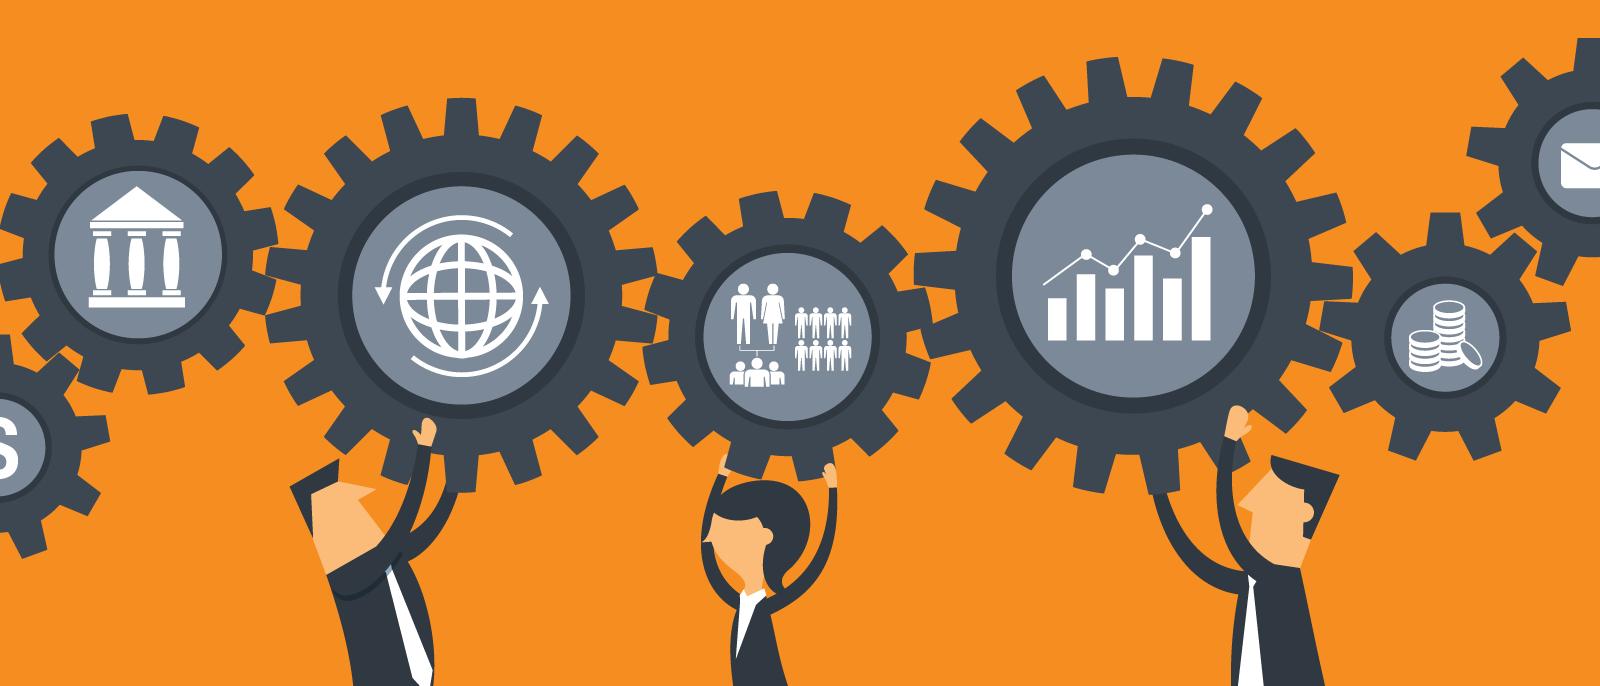 process-improvement-methodologies-header.png